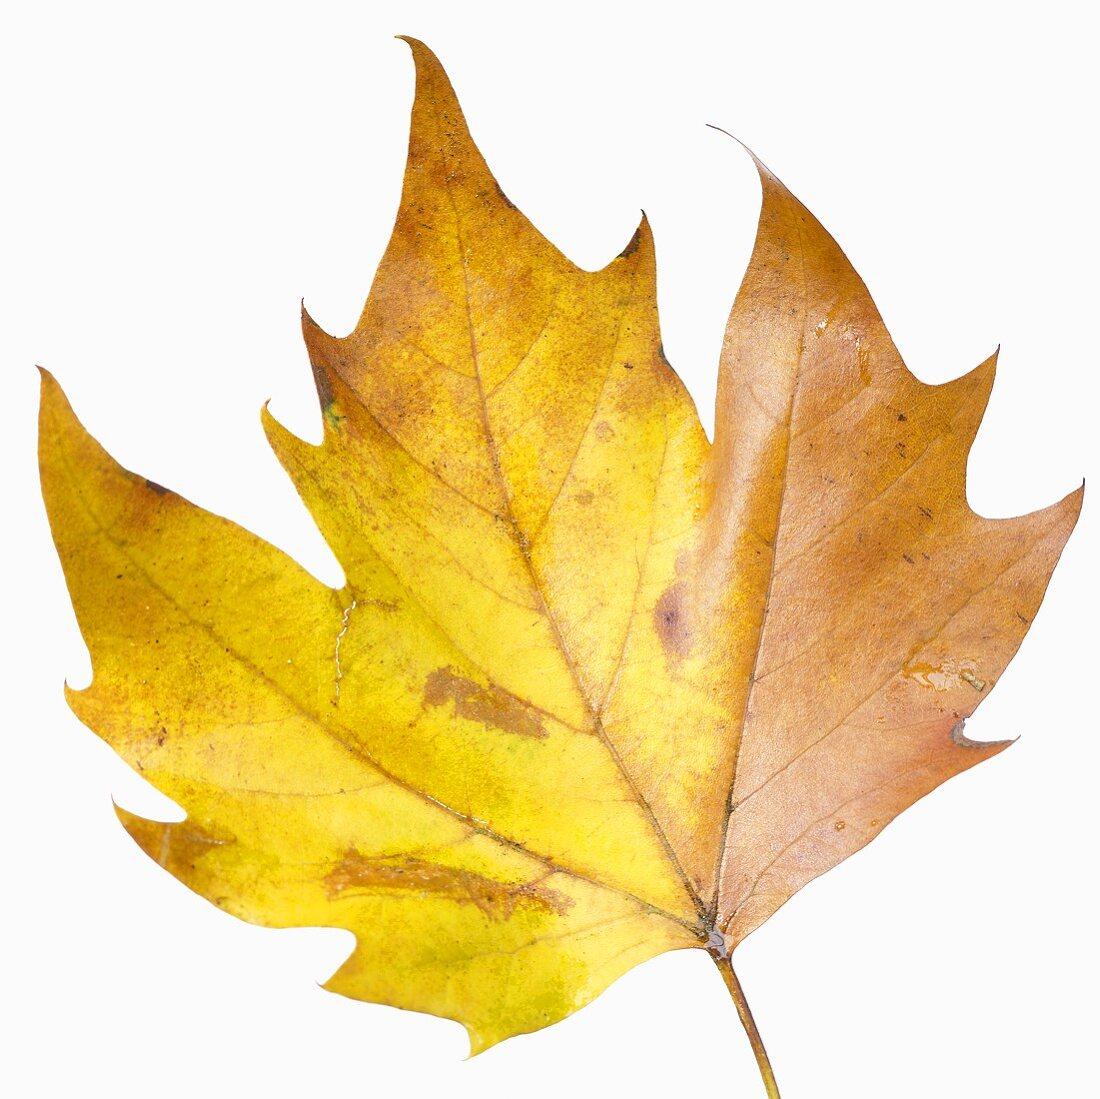 London plane leaf (Platanus x hispanica)